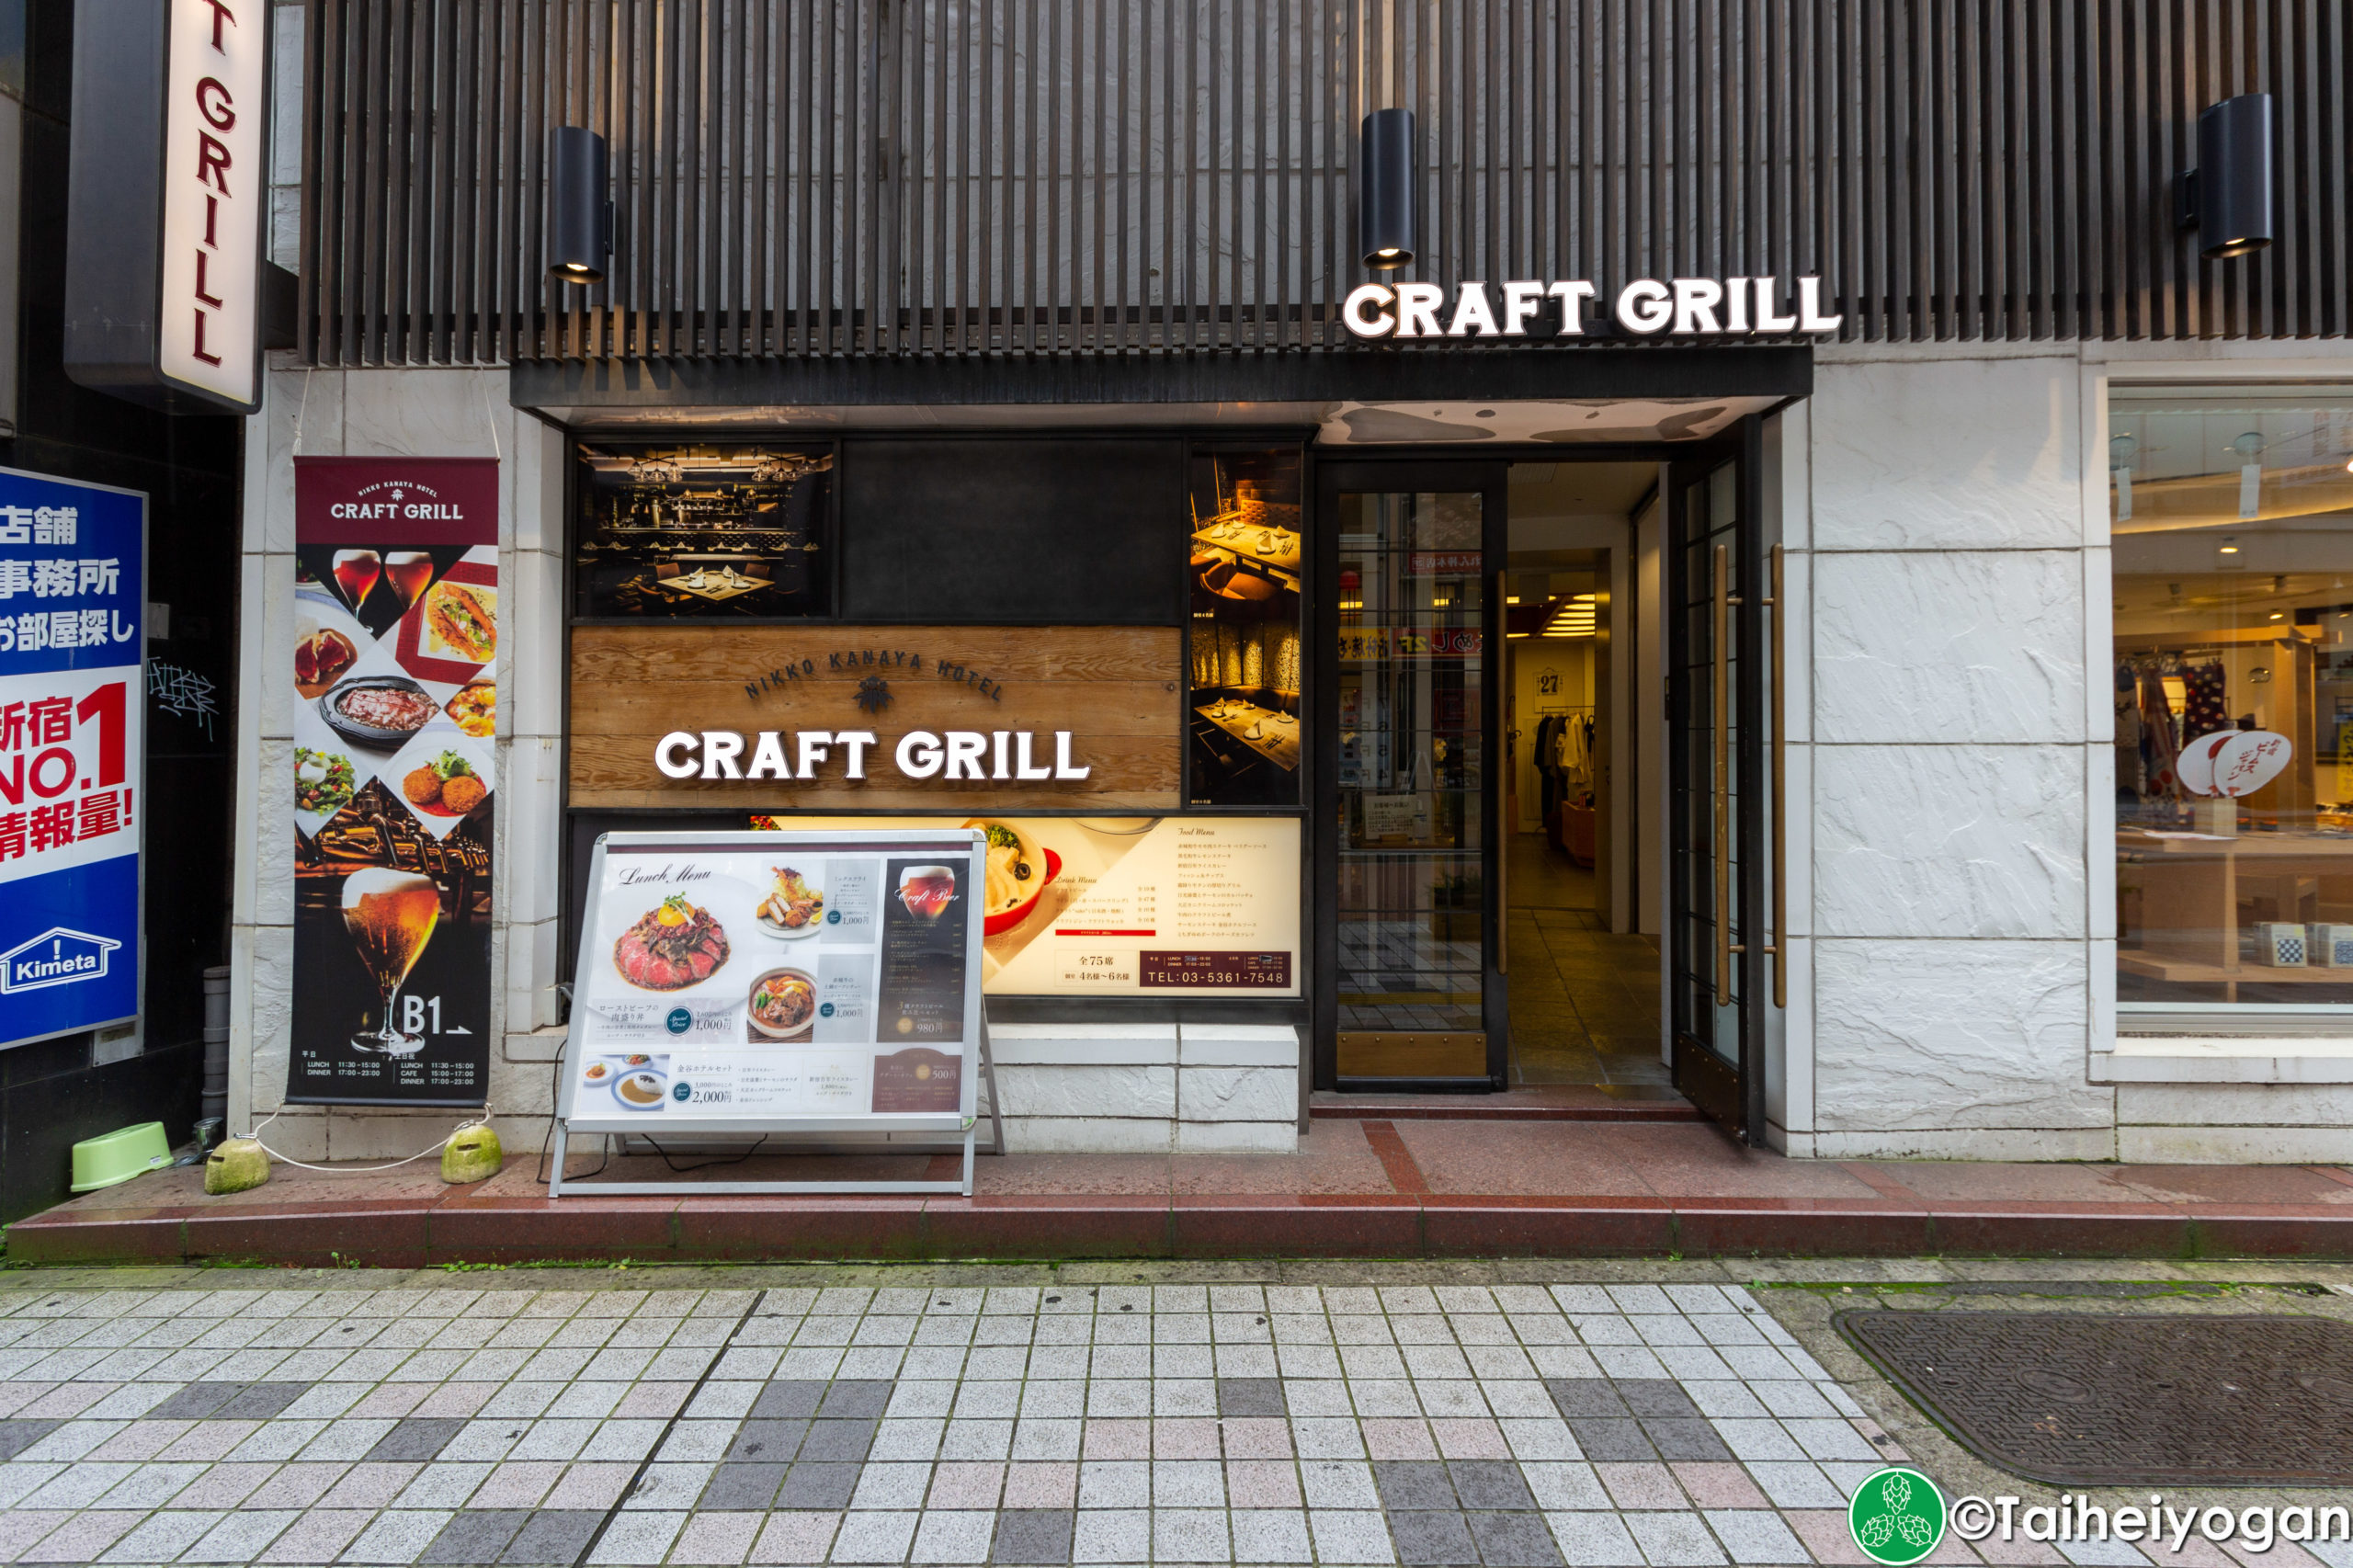 Nikko Kanaya Hotel Craft Grill Craft Beer Resource Japan Taiheiyogan